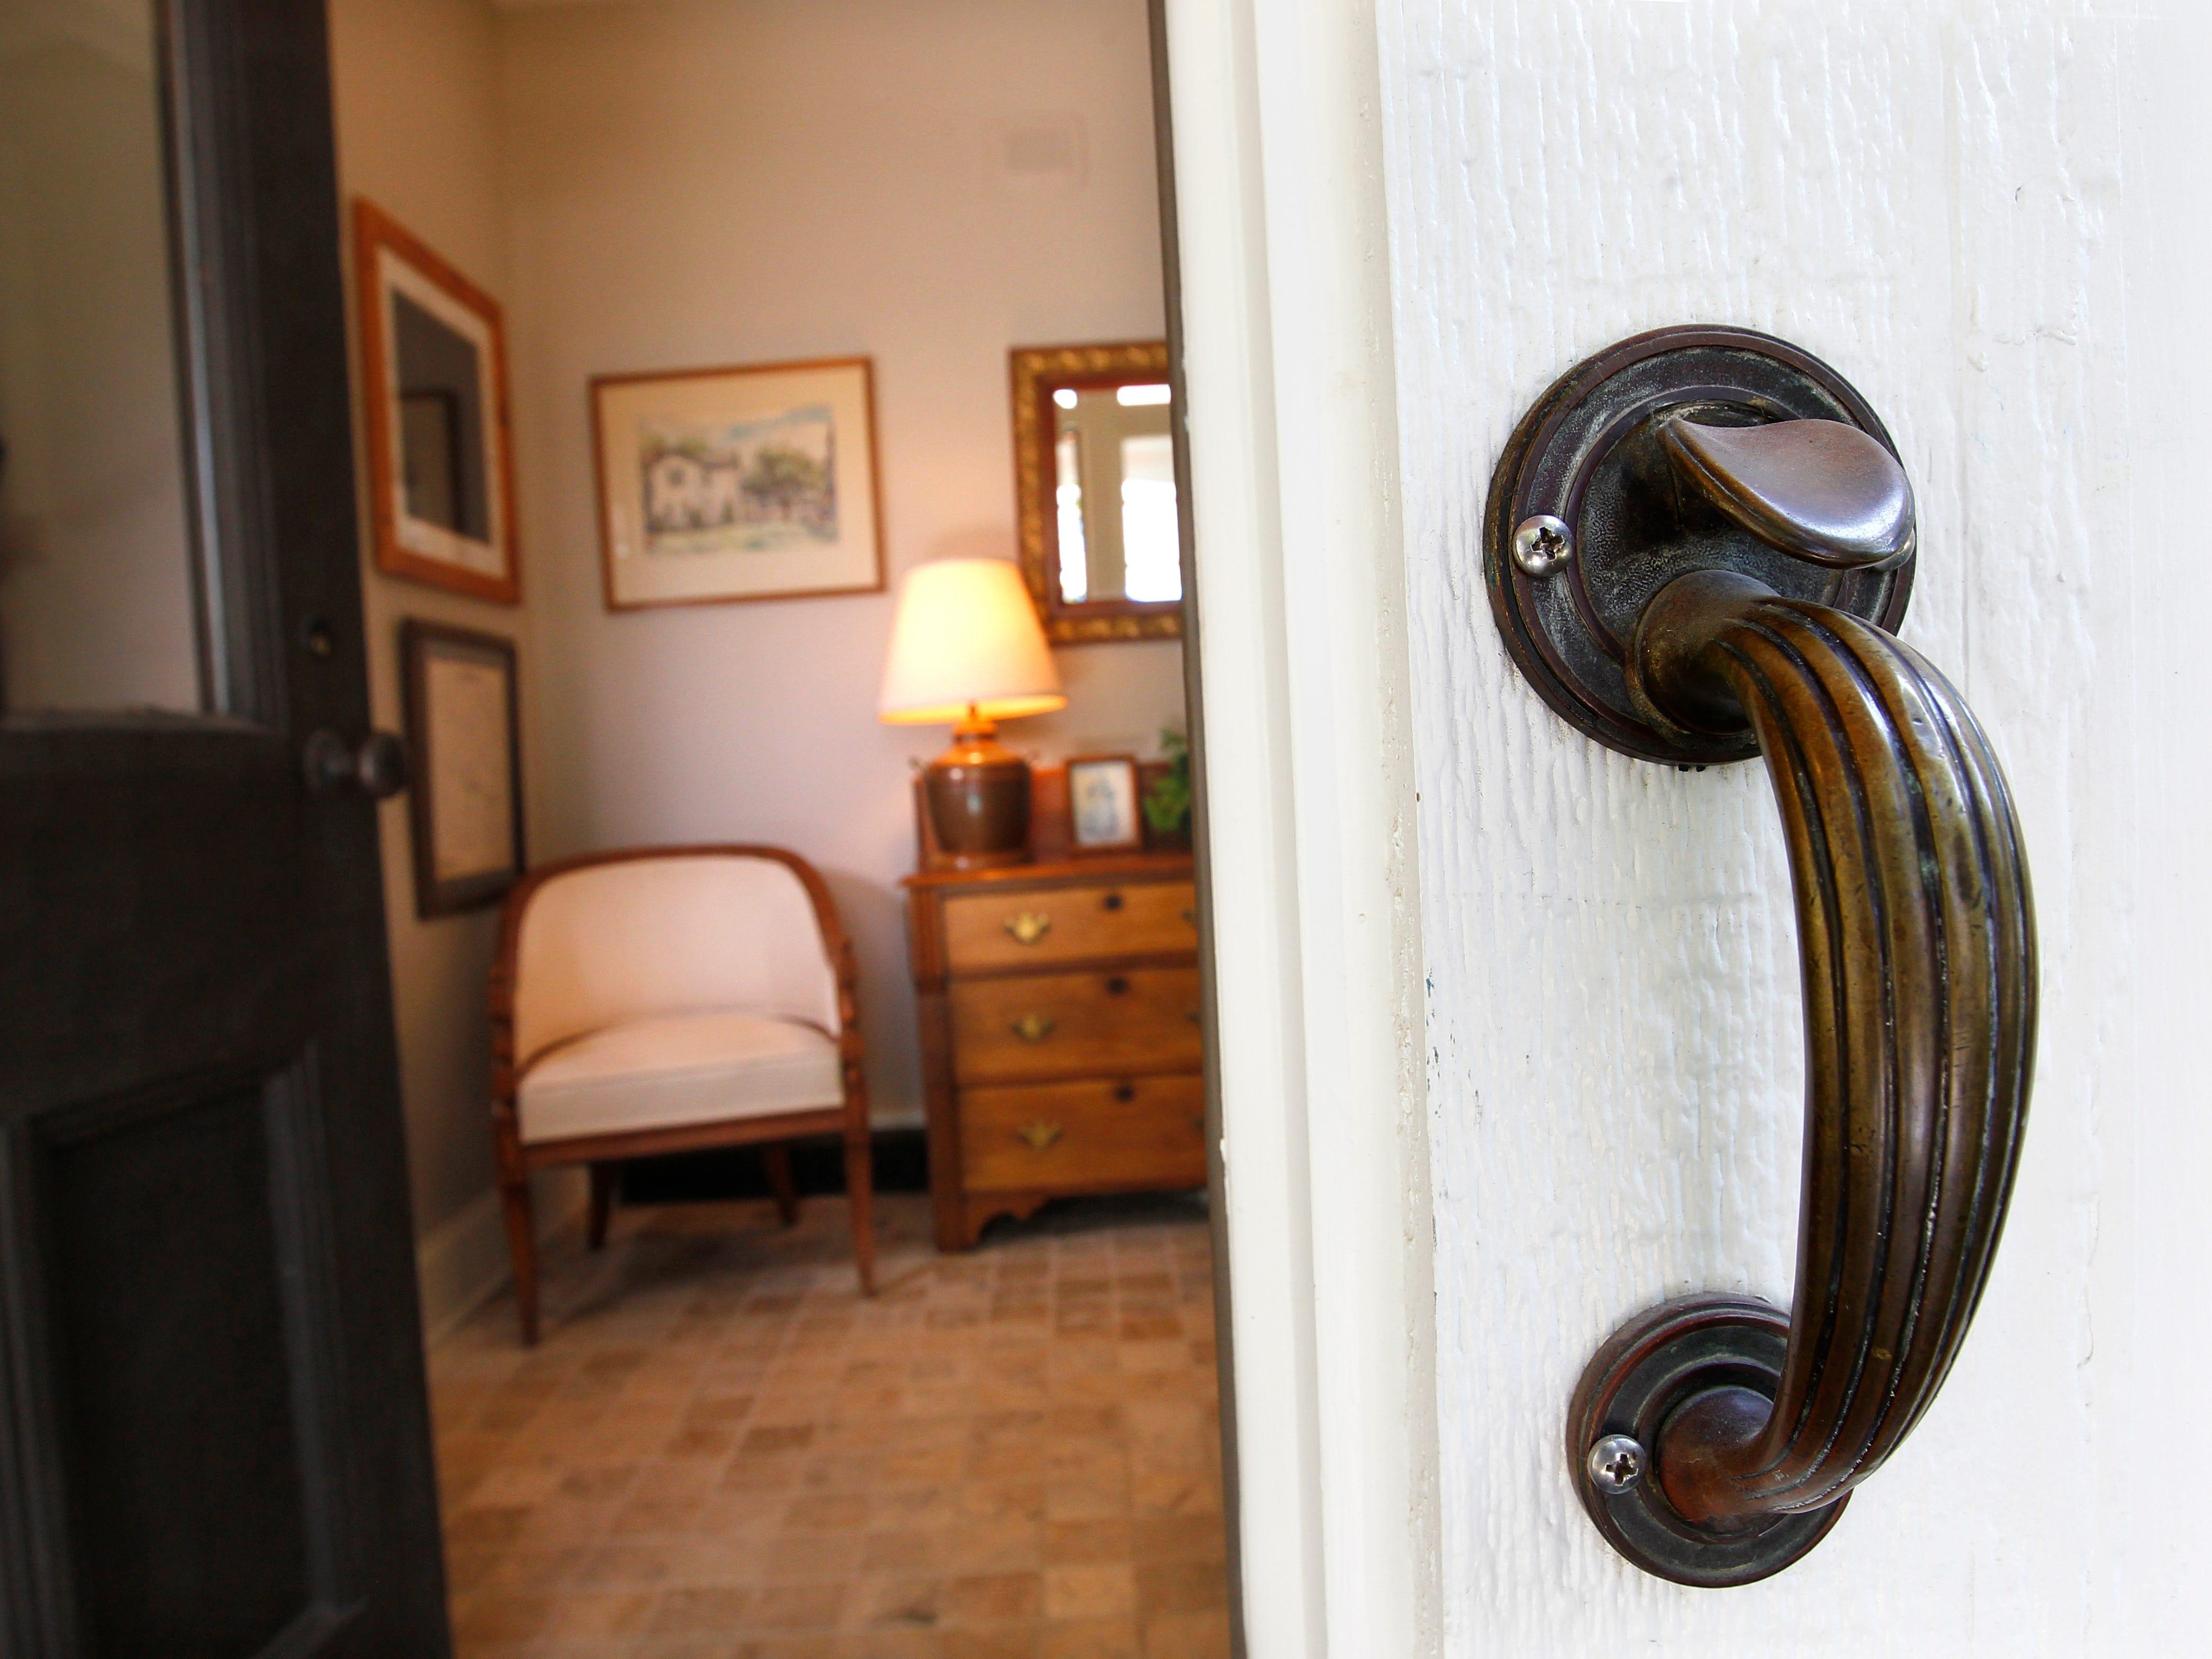 A door handle from the home's original front door was added as a grab bar for the new front door.